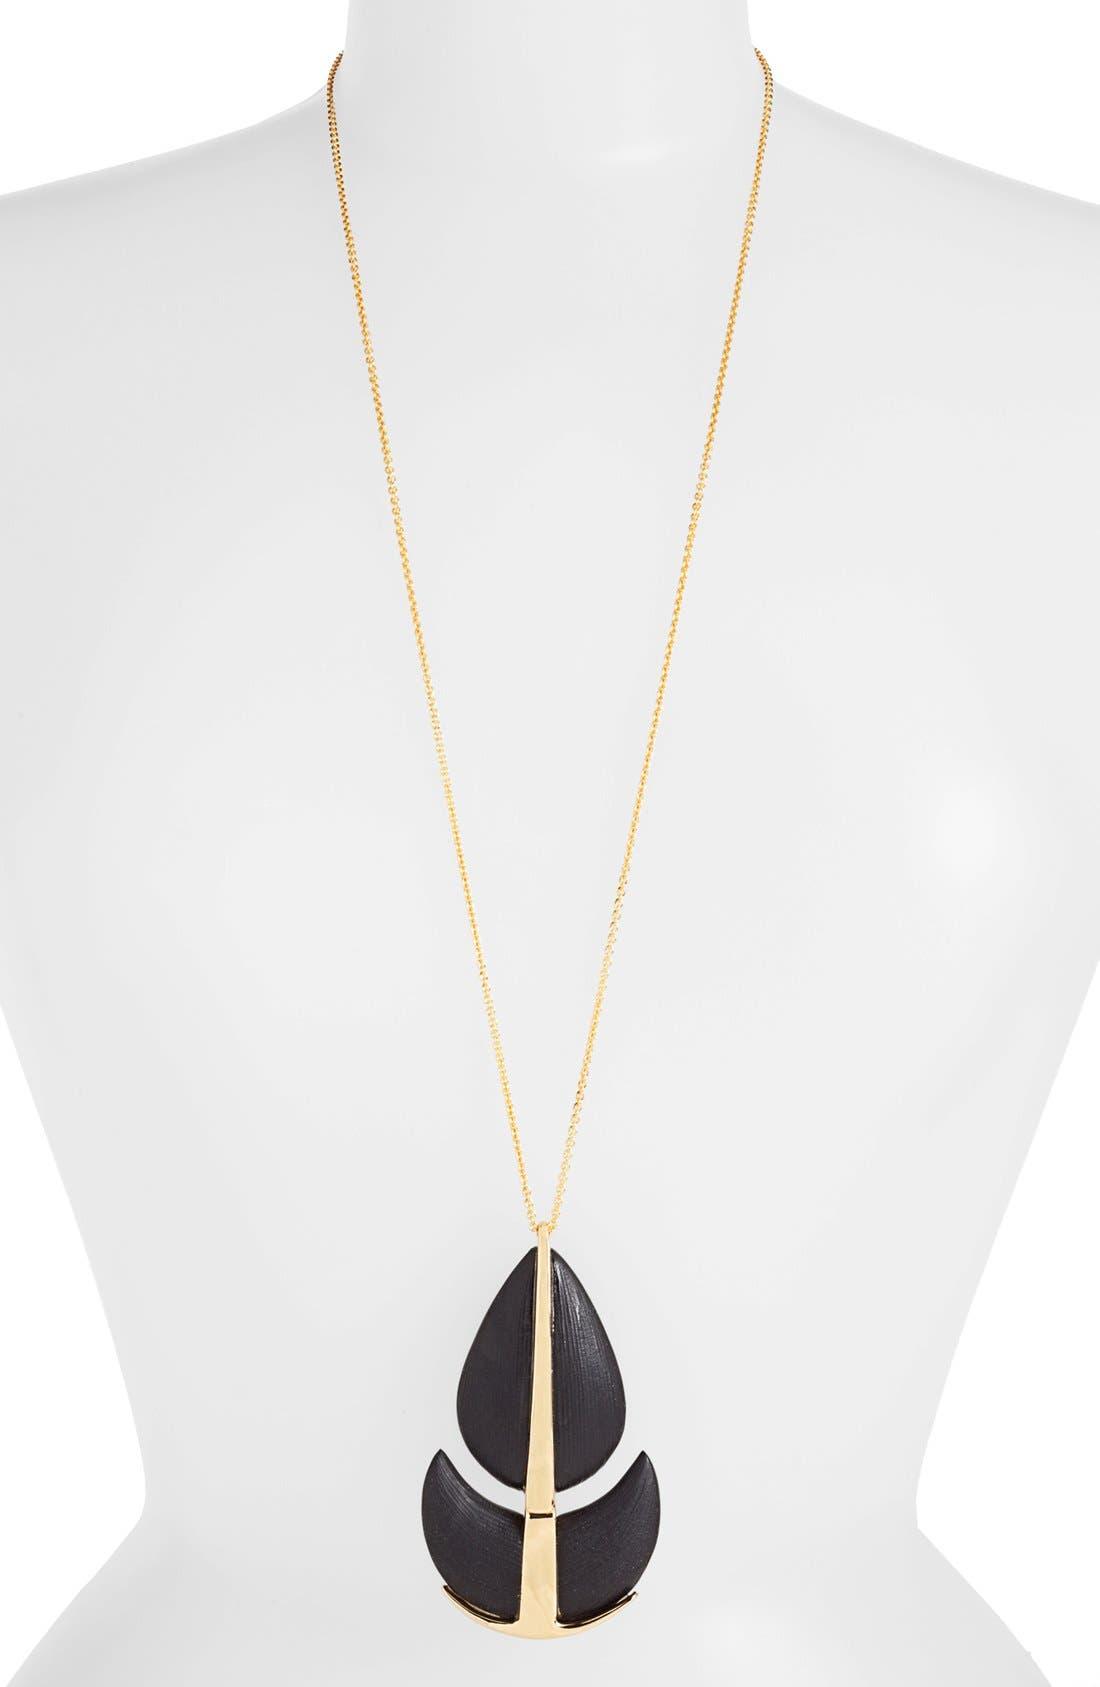 Main Image - Alexis Bittar 'Lucite® - Neo Bohemian' Long Pendant Necklace